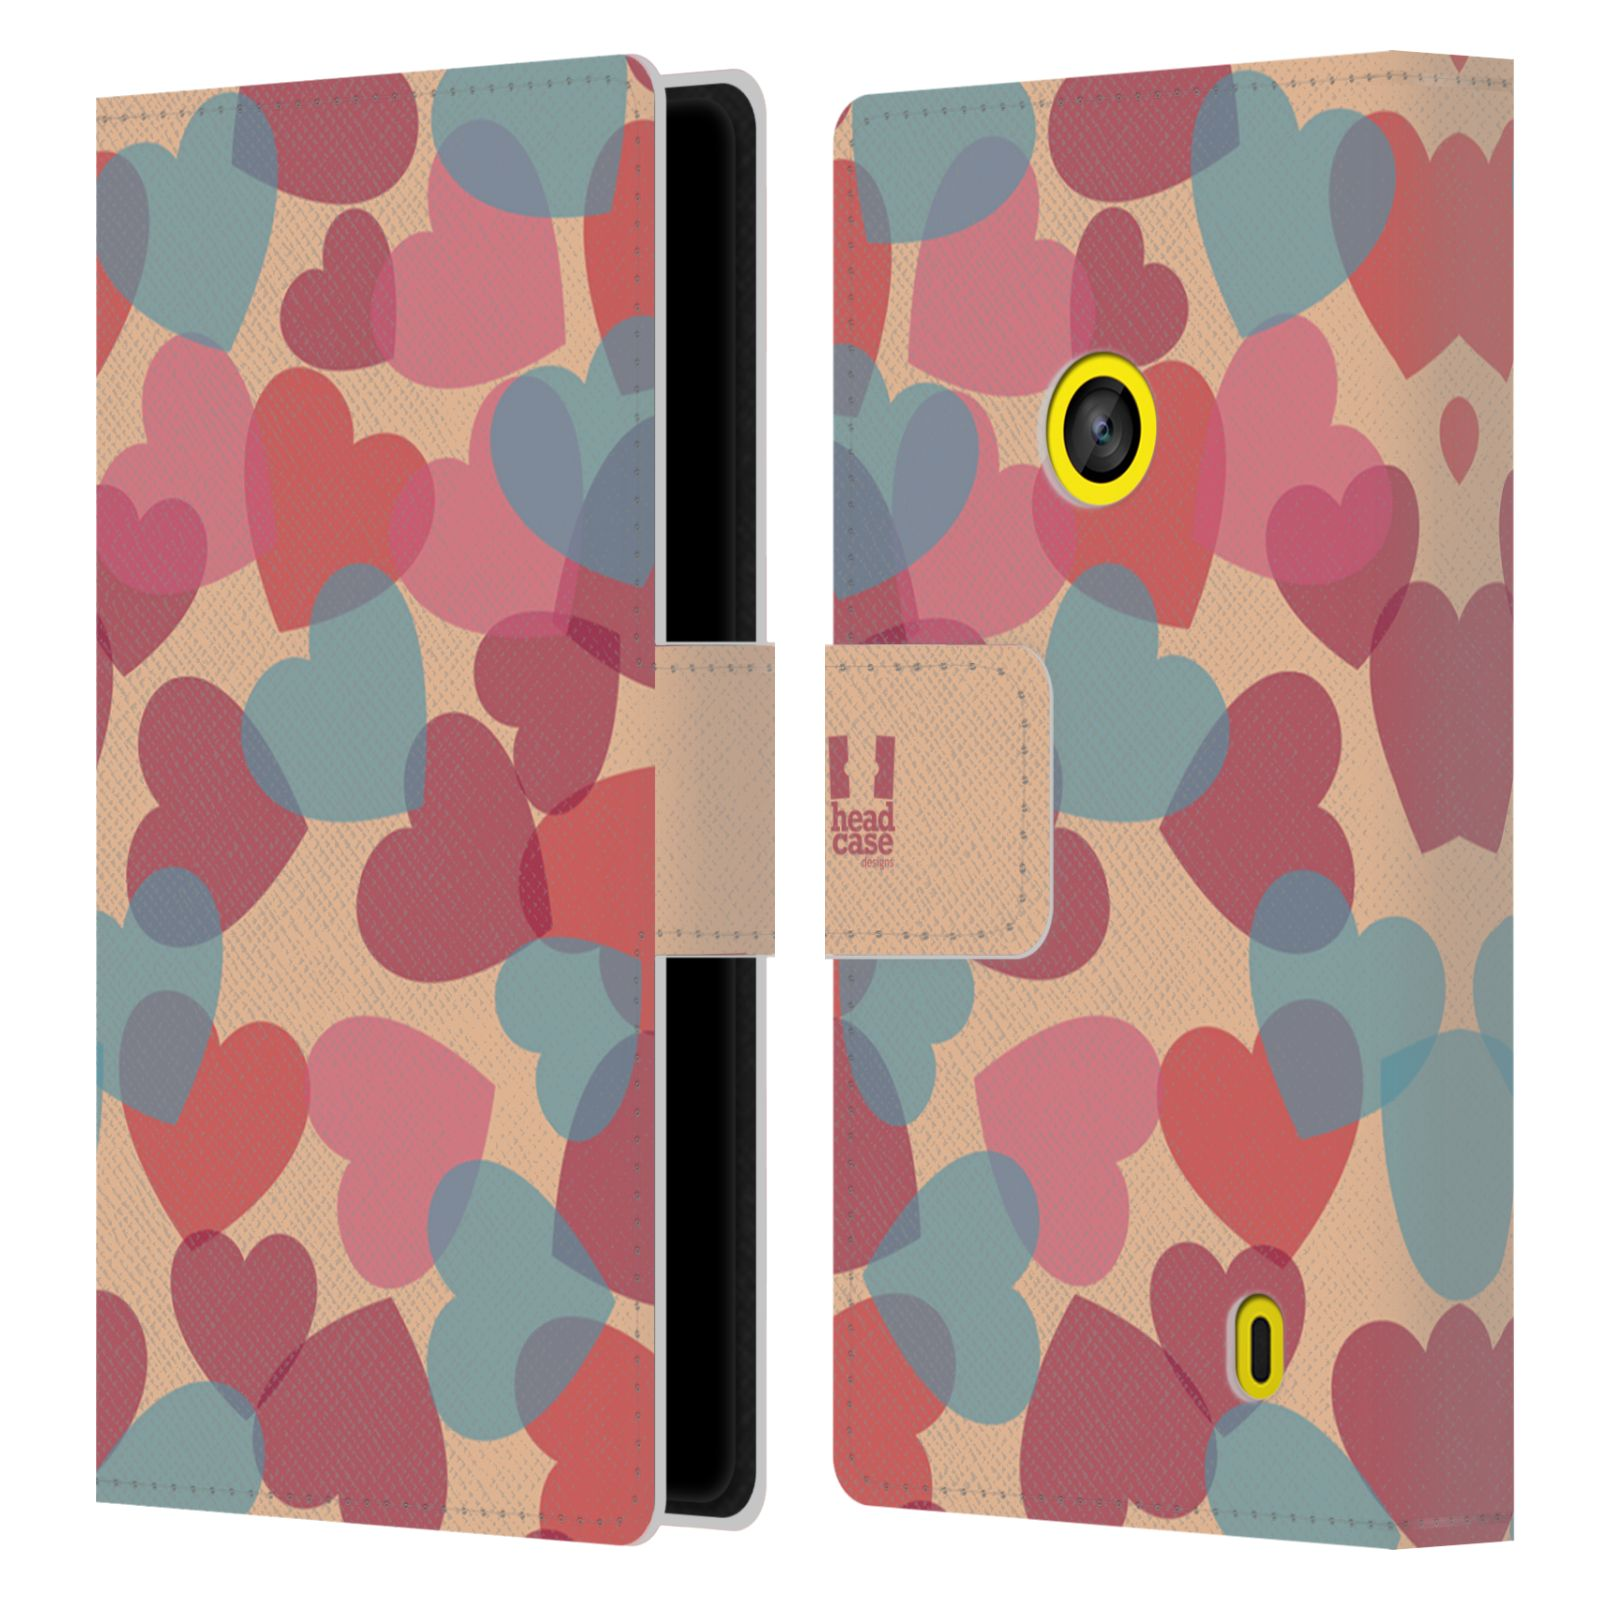 HEAD CASE Flipové pouzdro pro mobil NOKIA LUMIA 520 / 525 vzor prolínající se srdíčka, srdce, láska, růžová